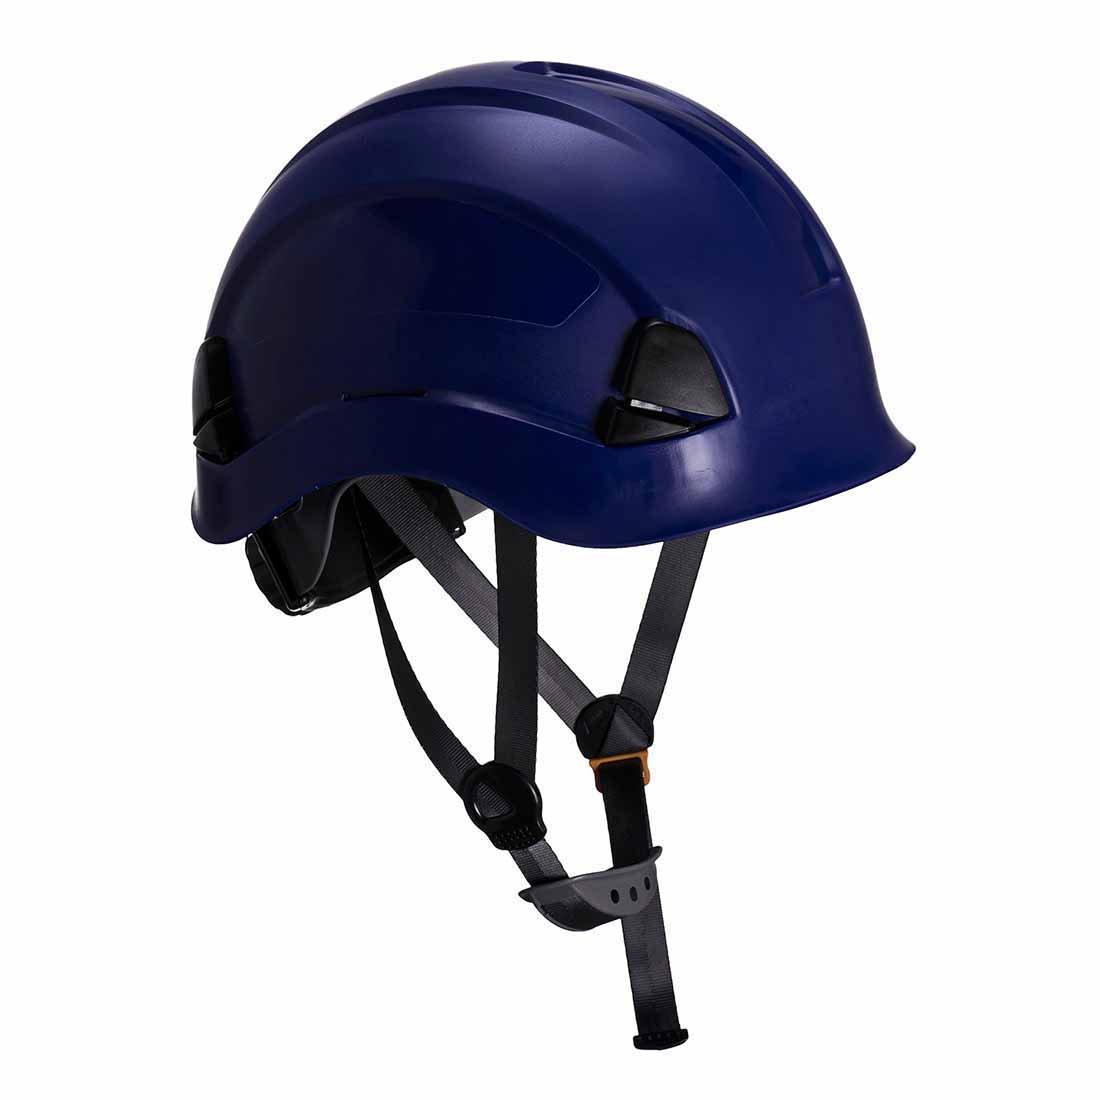 sUw - Site Safety Workwear Height Endurance Helmet Black Regular PS53BKR